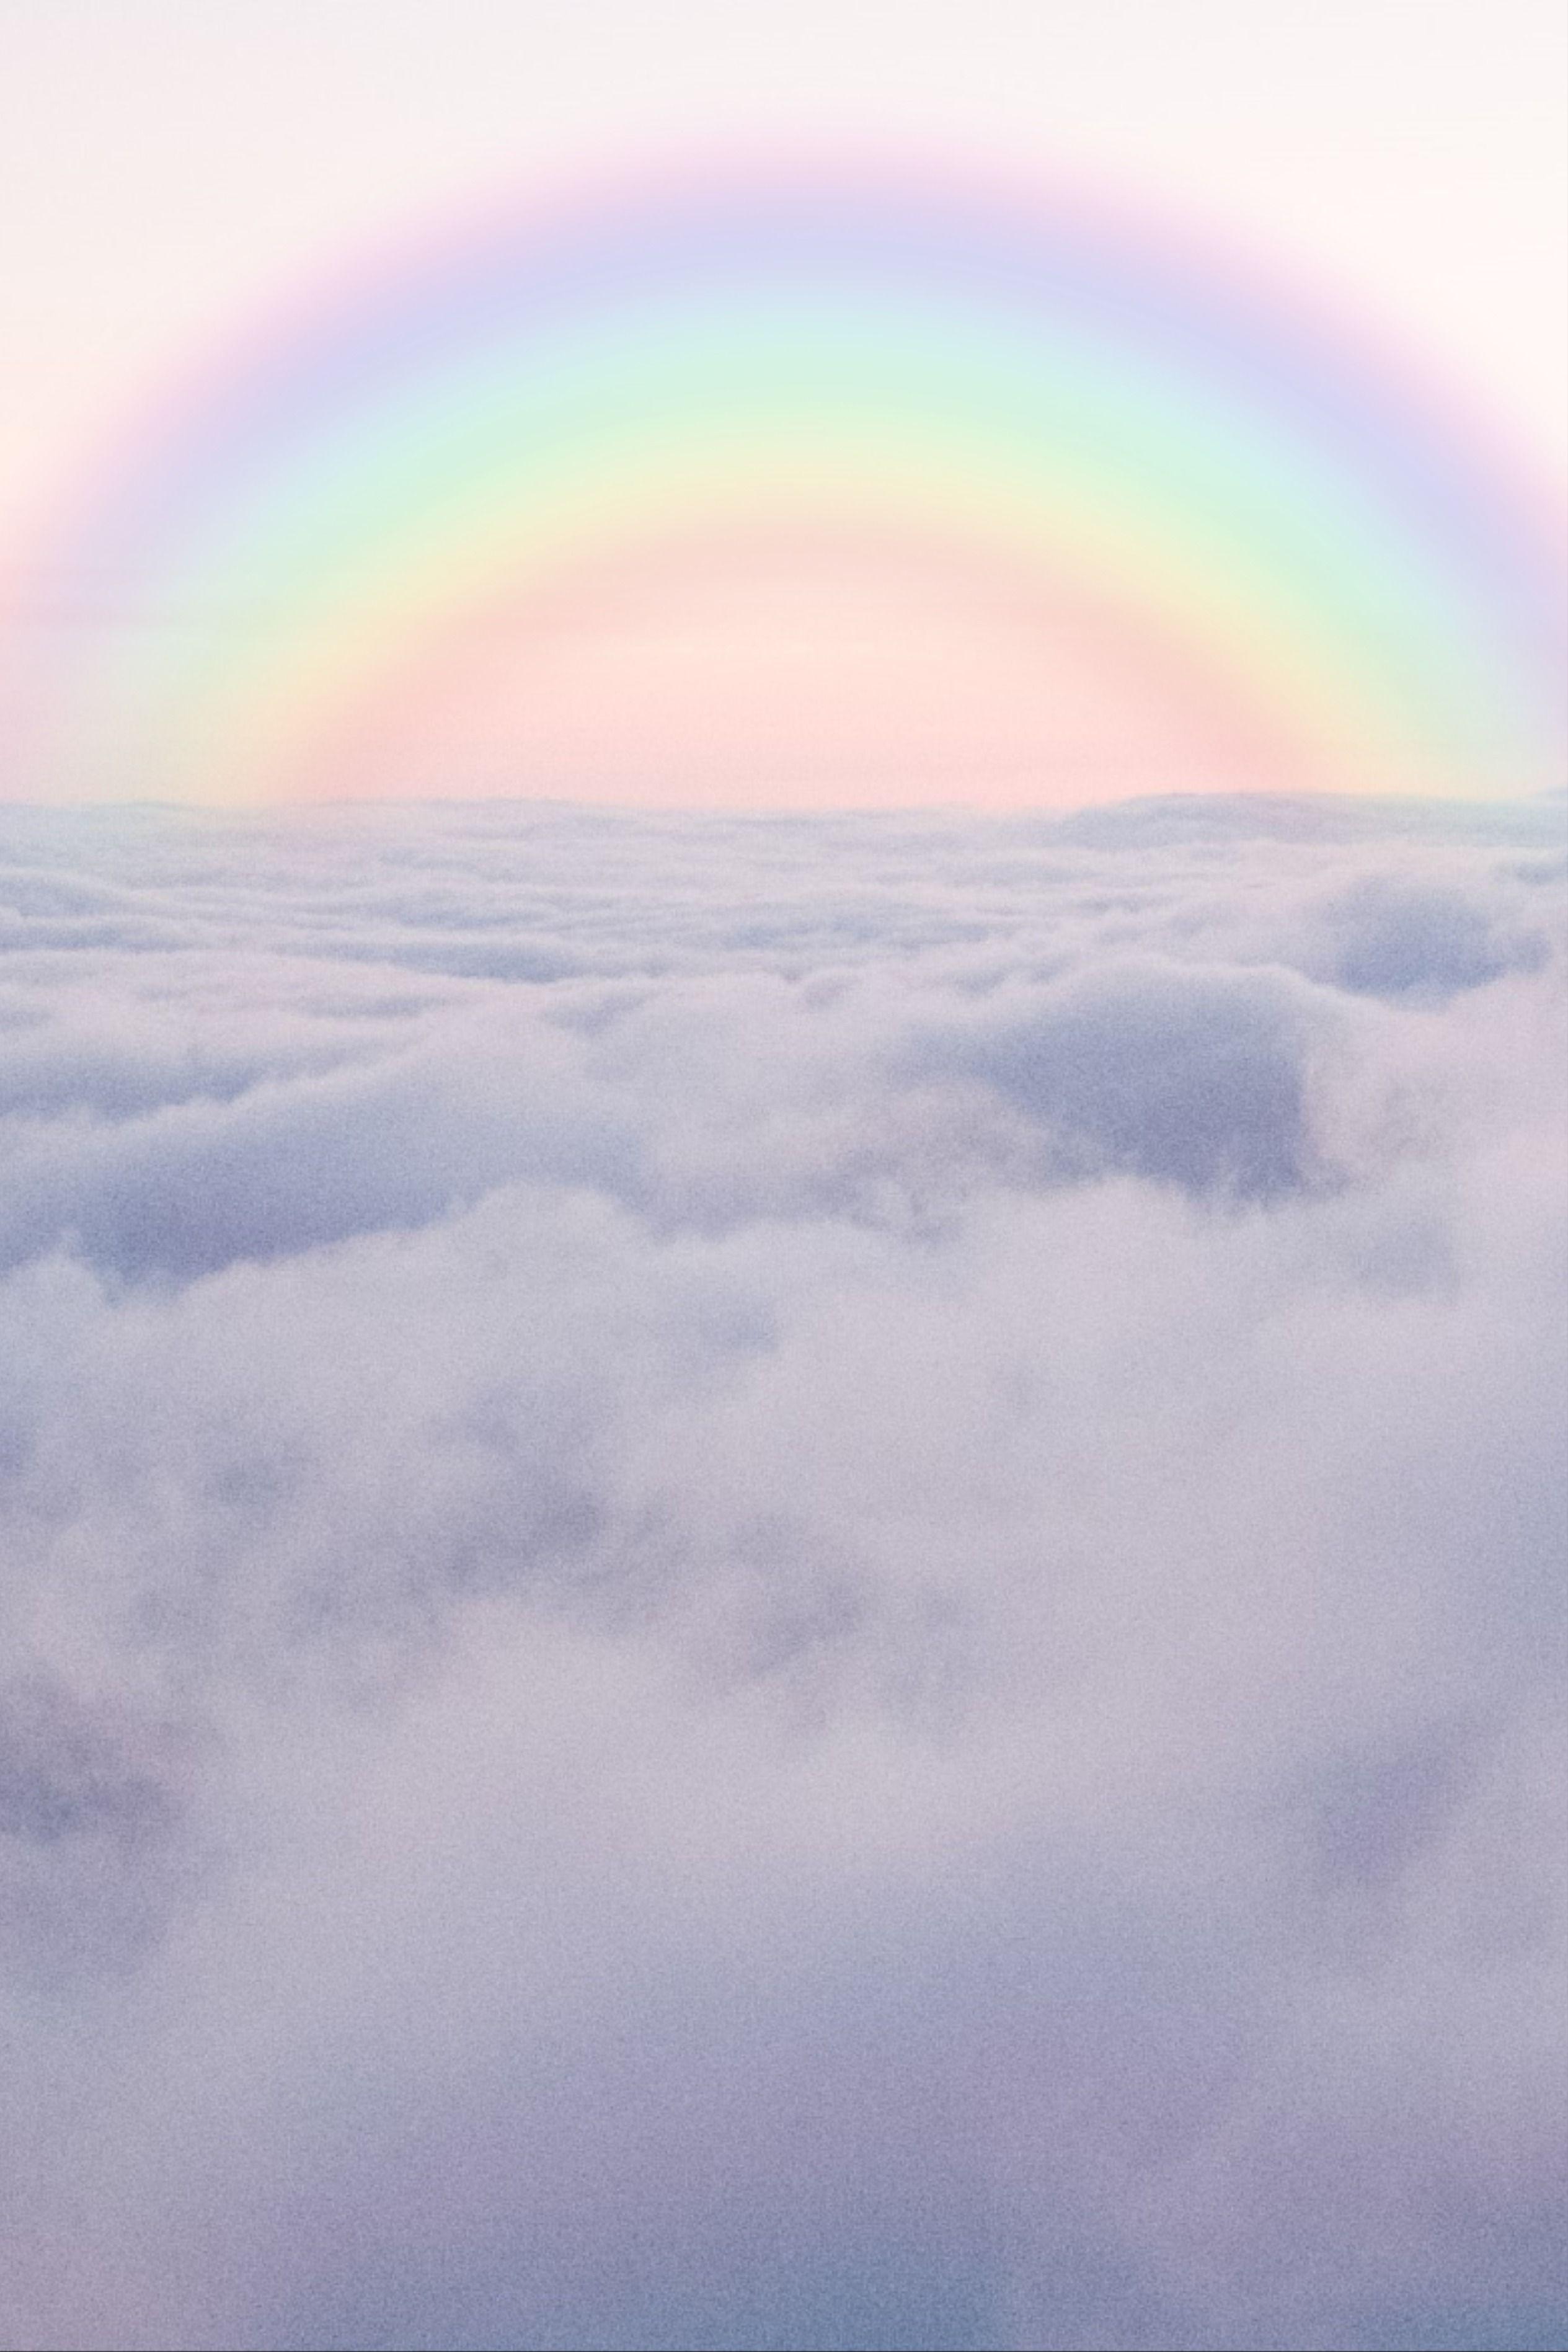 Cute Aesthetic Iphone Wallpaper X Rainbow Wallpaper Iphone Pastel Iphone Wallpaper Cloud Wallpaper